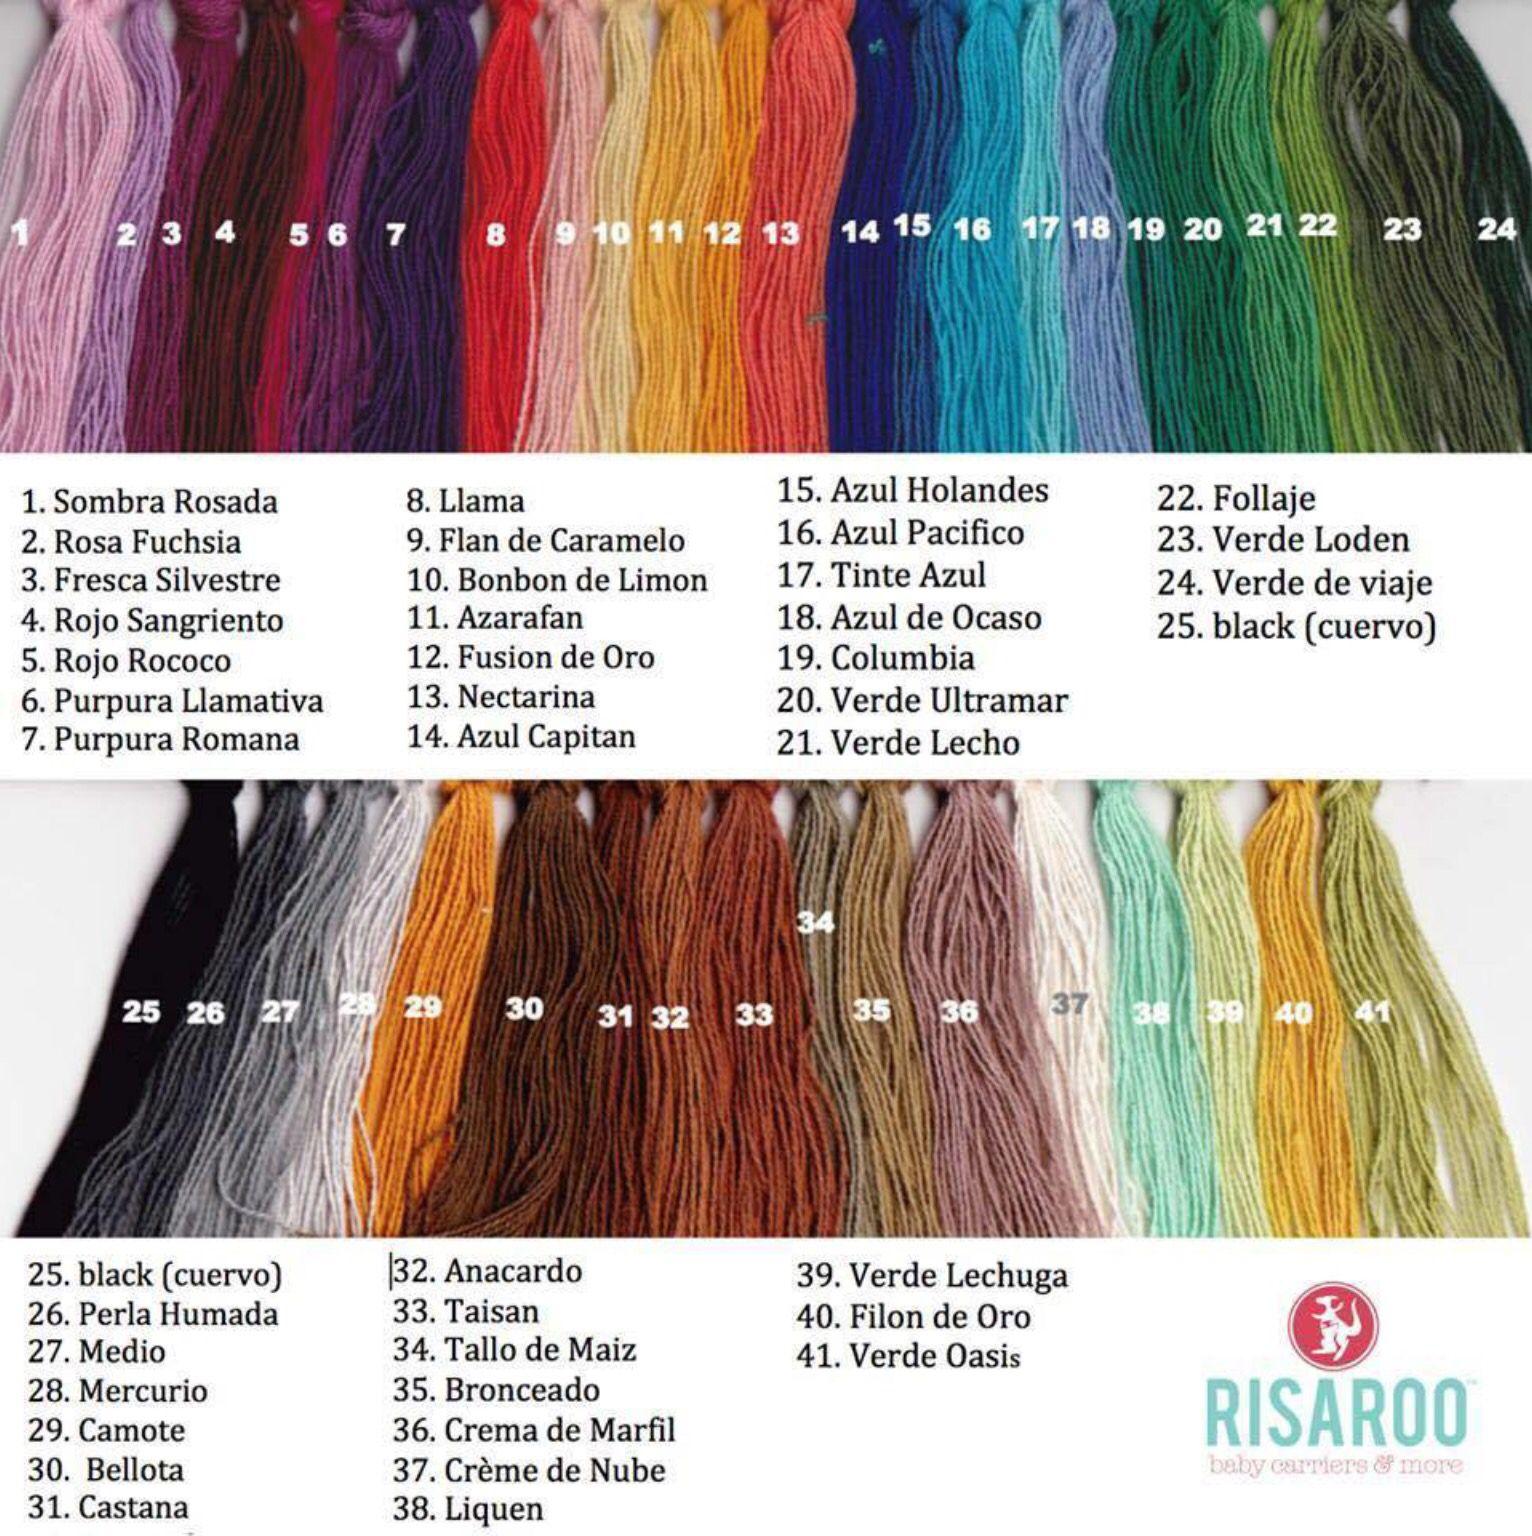 fa4da2fcaf4 Girasol Weft Colors. Girasol Weft Colors Woven Wrap